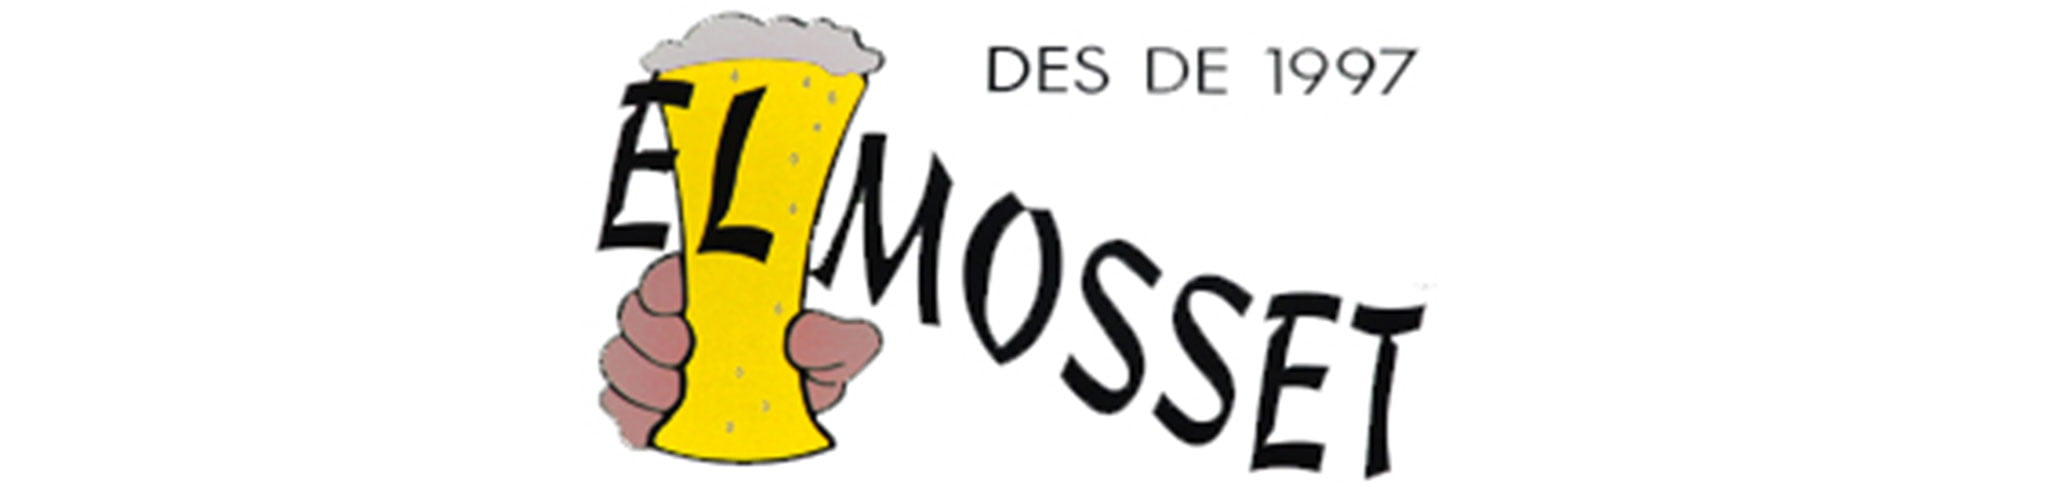 El Mosset's logo